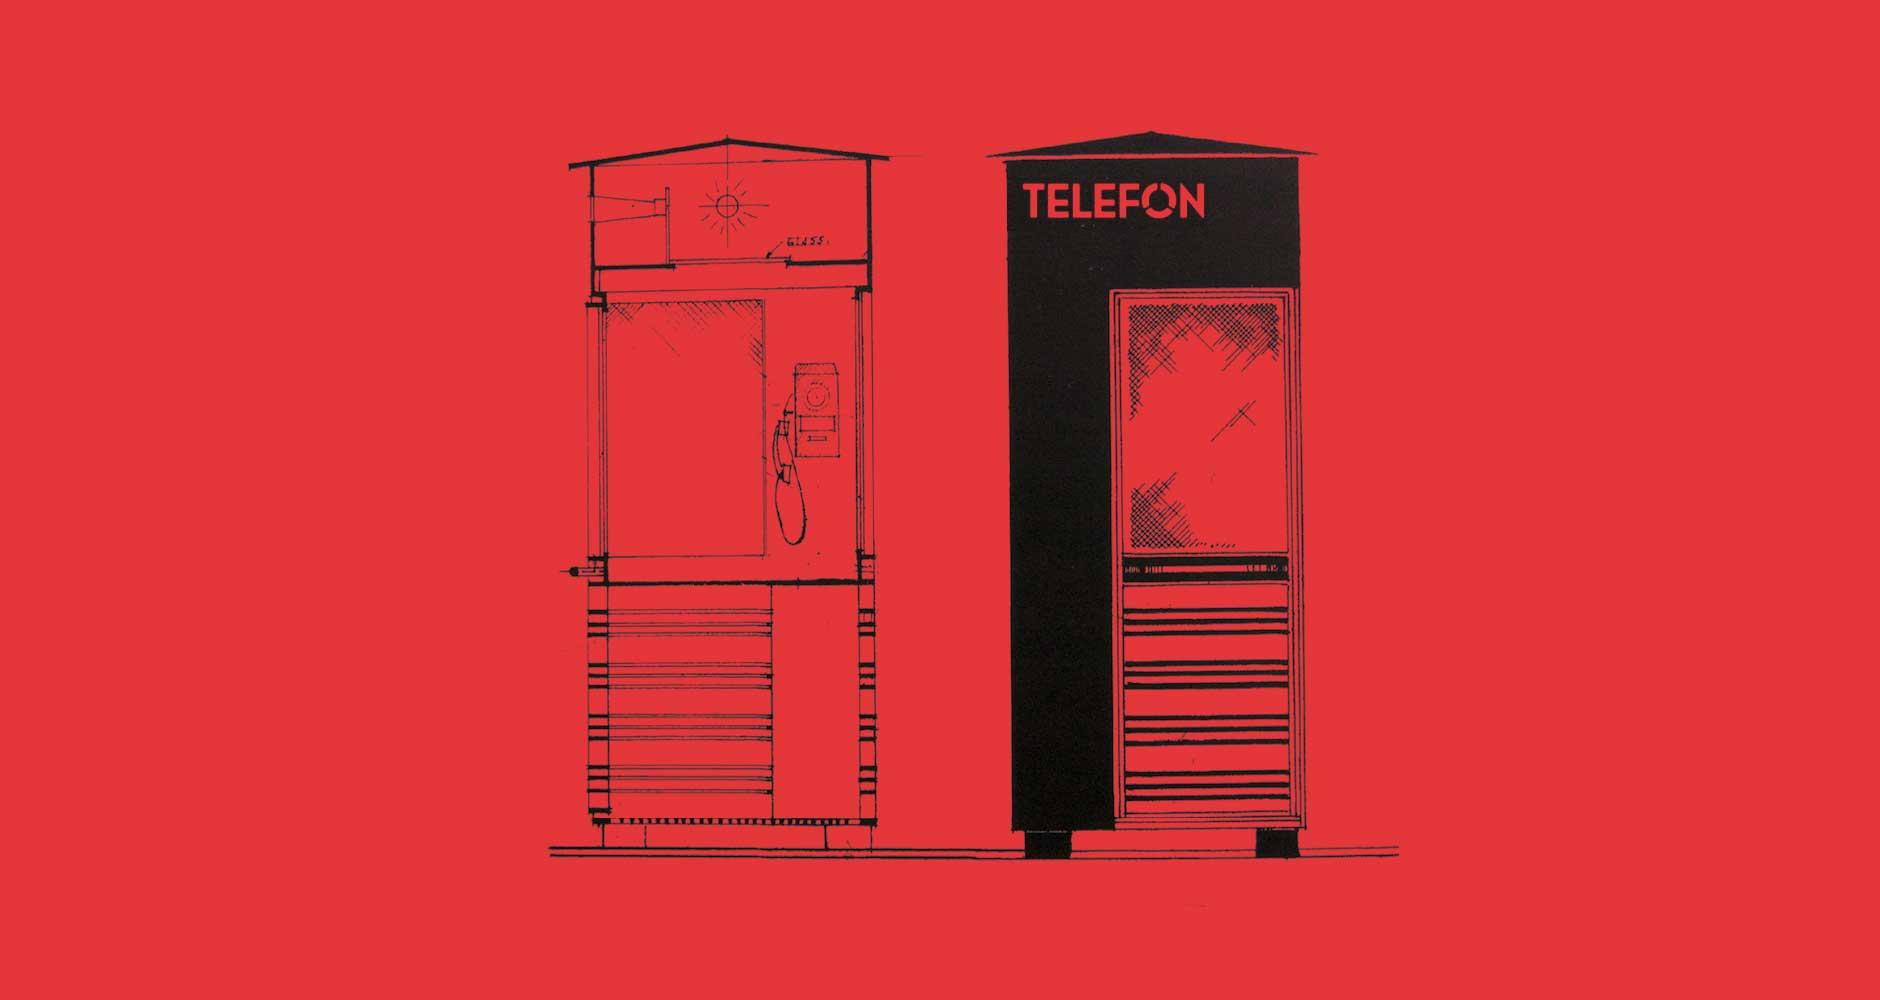 telefon font type poster